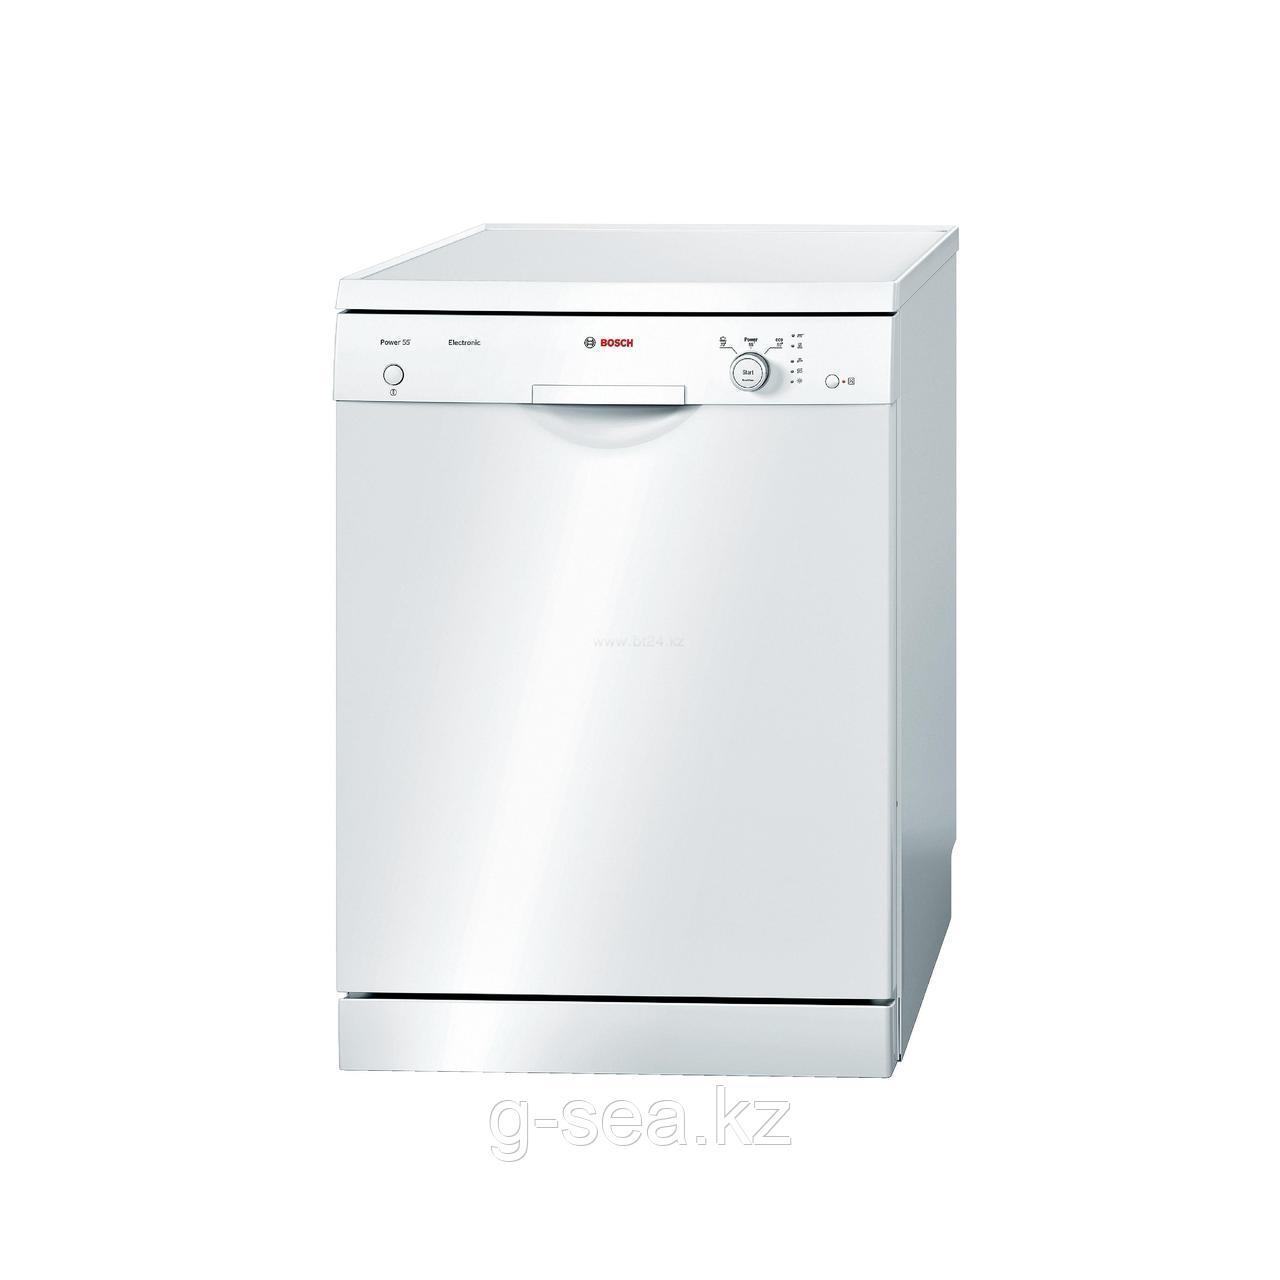 Посудомоечная машина Bosch SMS 23BW00T